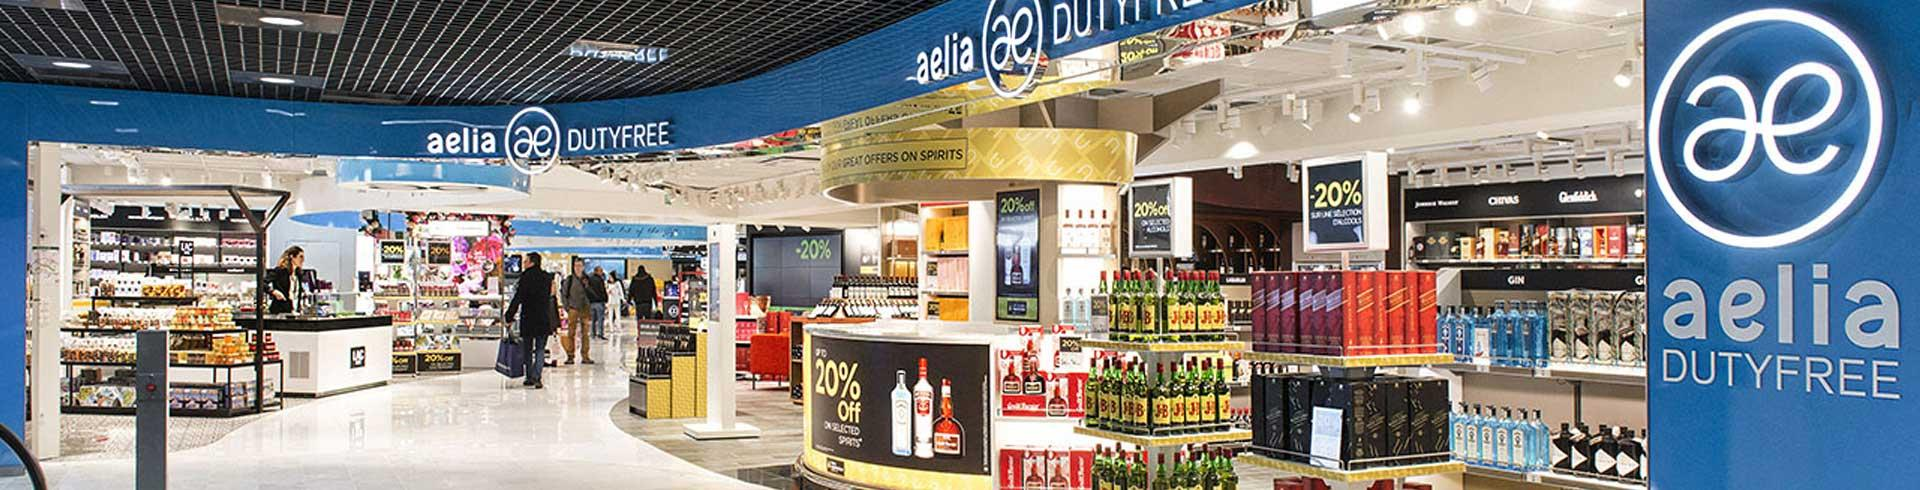 Aelia Duty Free Arrival   Liquor   Perfumes   Terminal 1   Shops ... aef9aabf97